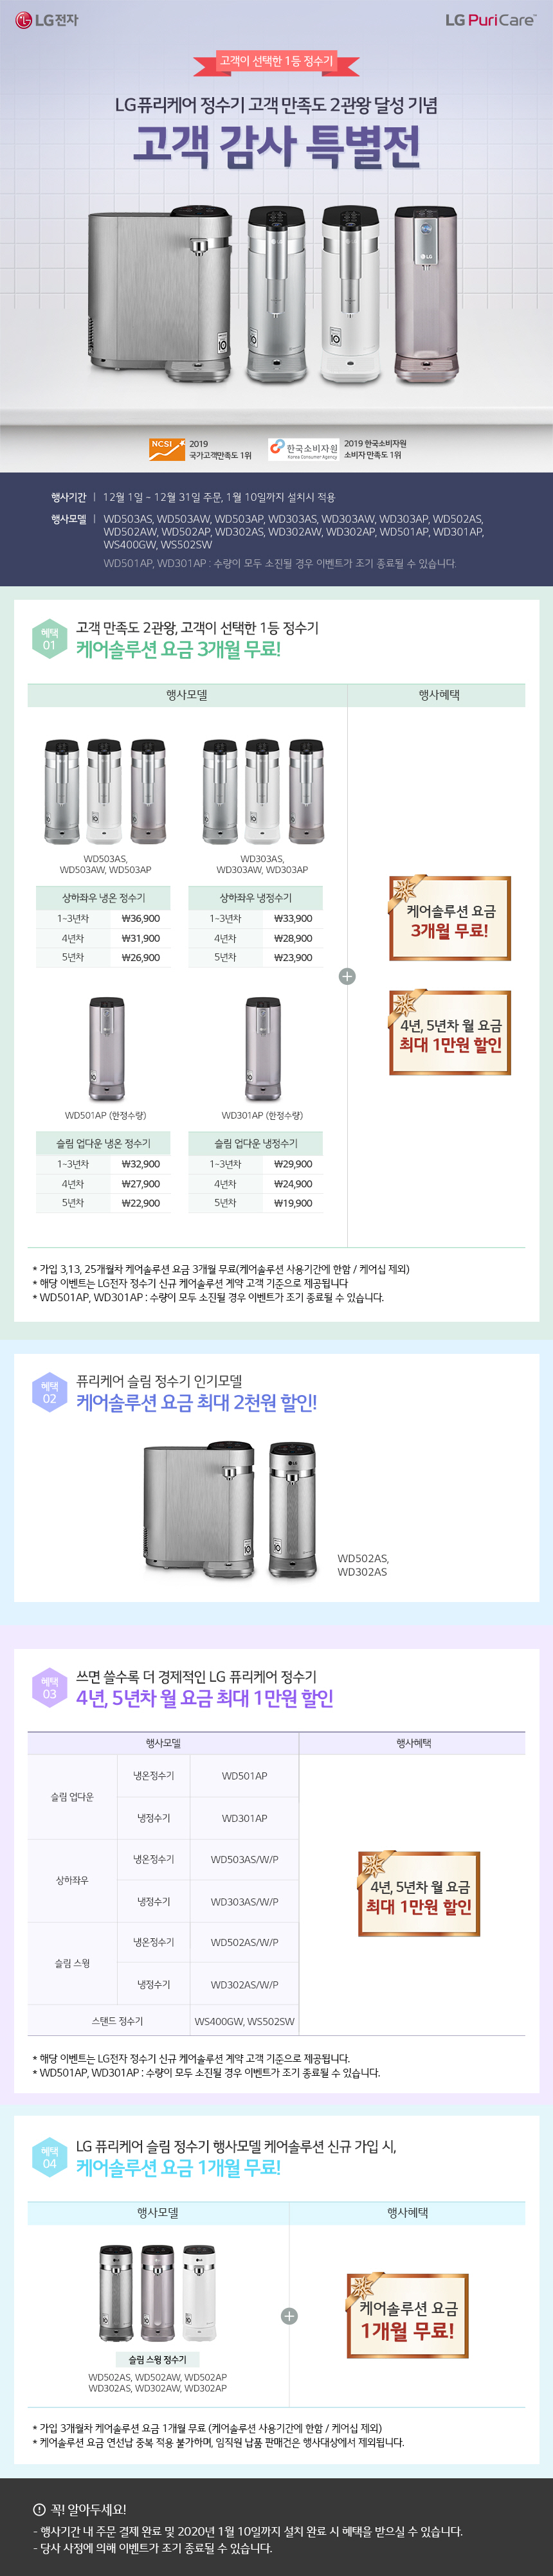 [USP배너 - 판촉] 12월_LG 퓨리케어 정수기 프로모션.jpg